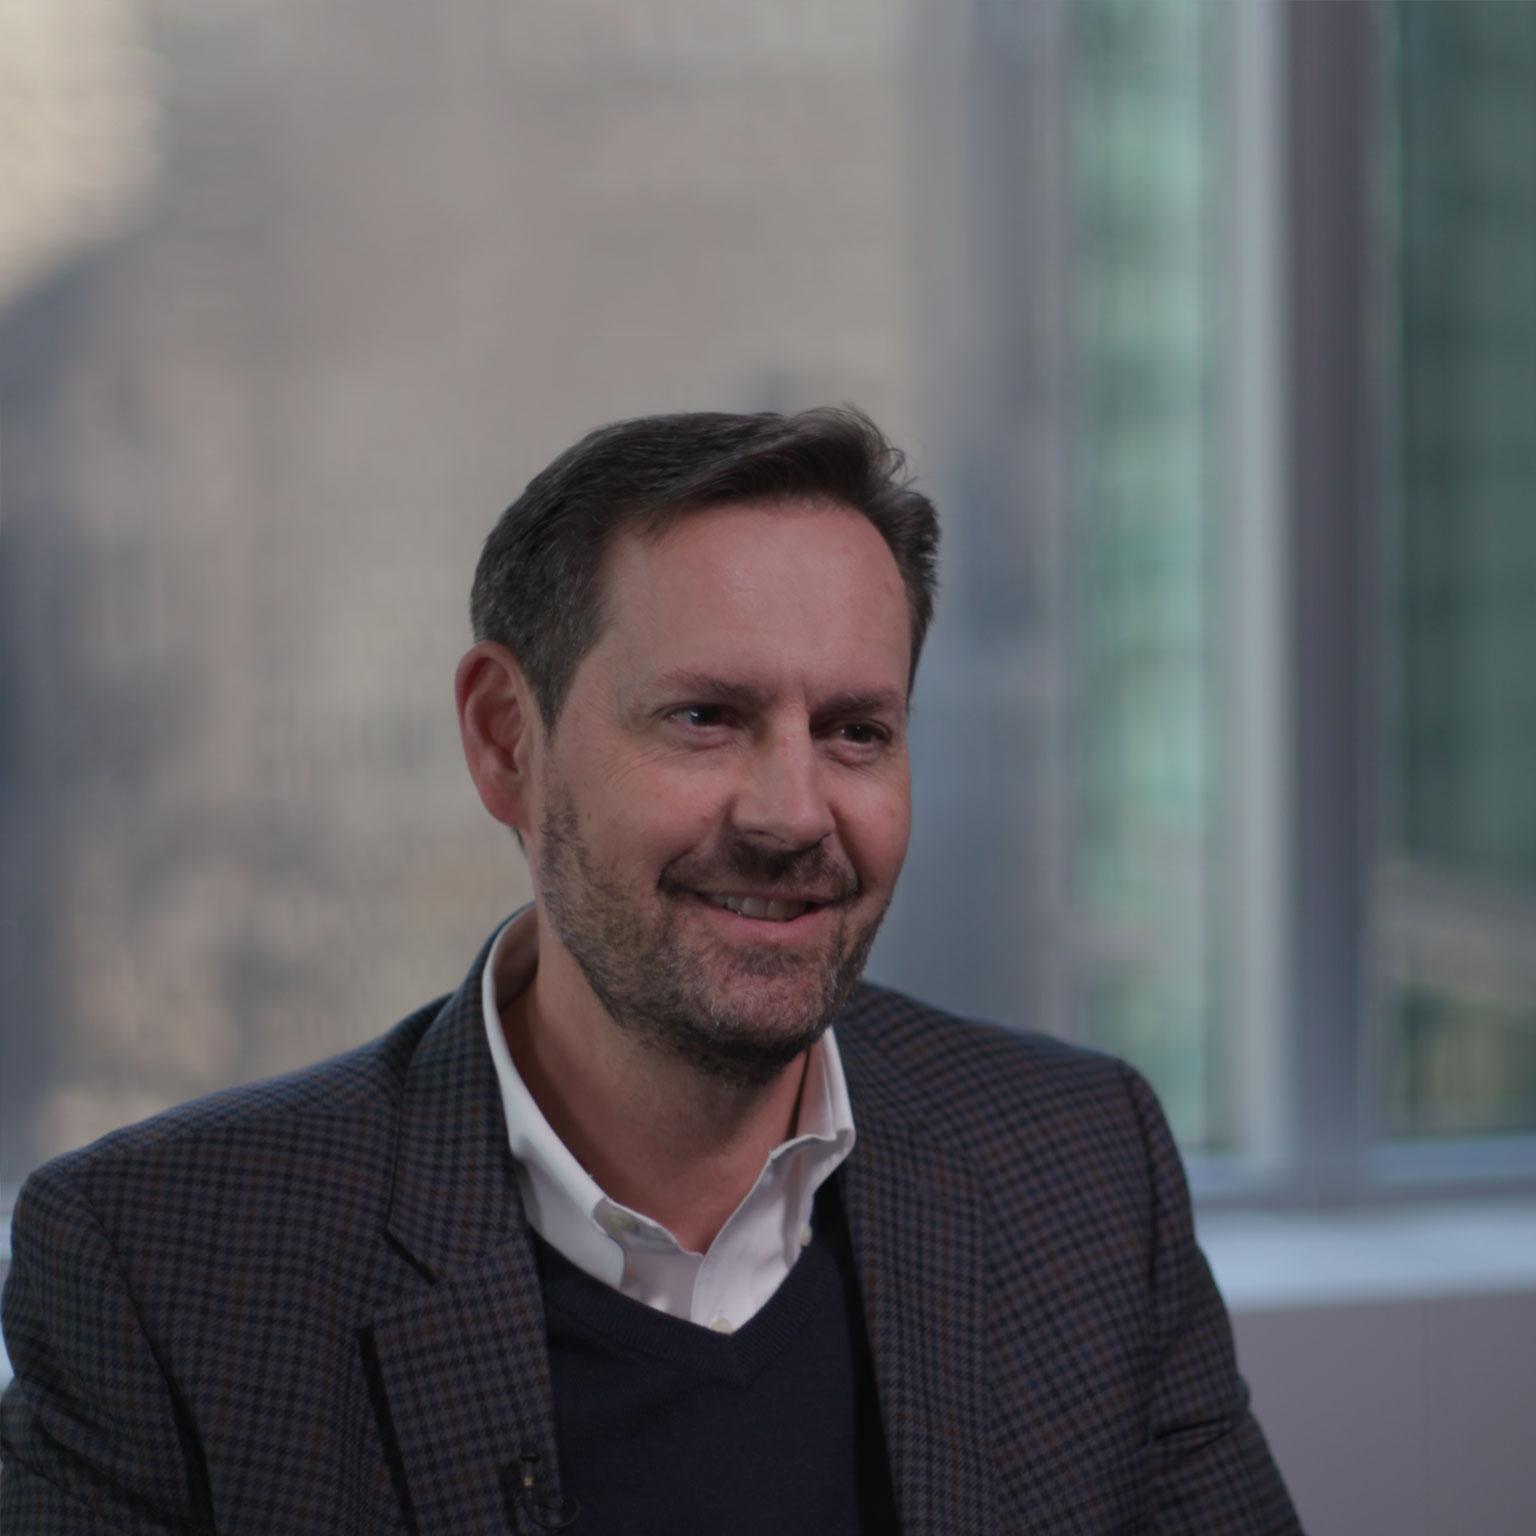 Interview with Cameron Davies of NBC Universal | McKinsey